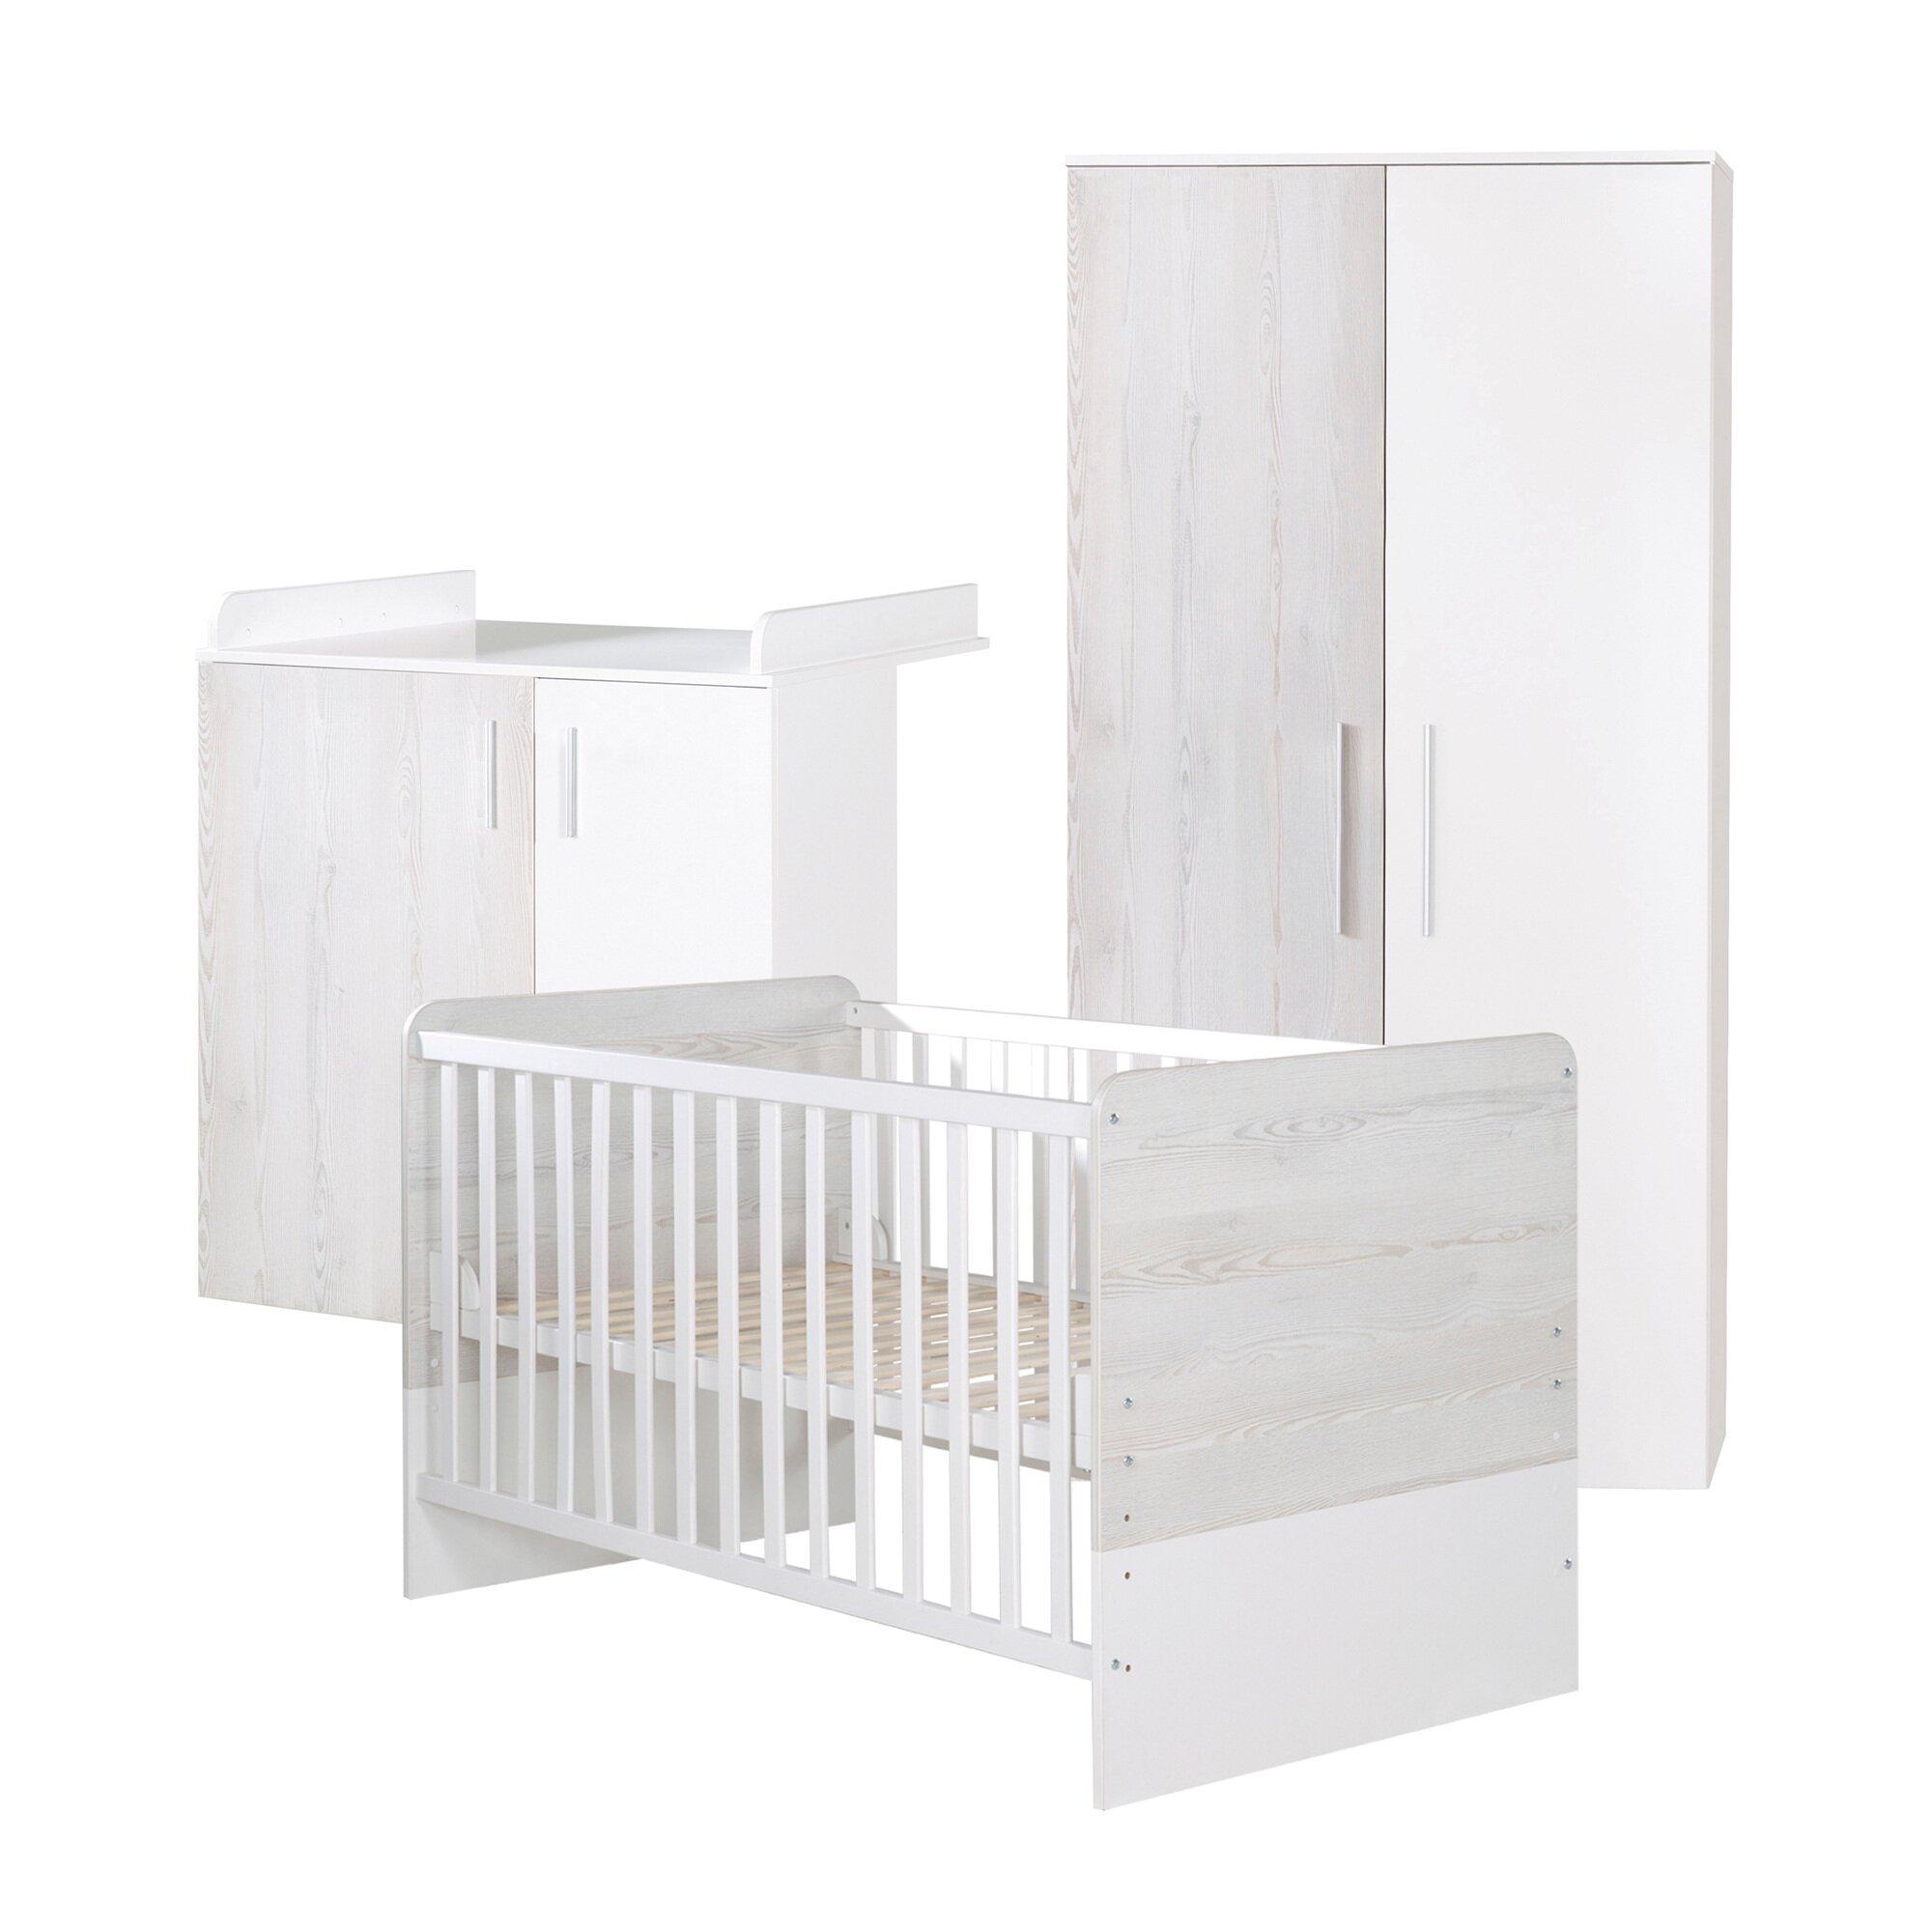 Roba Kinderzimmer-Set ALENJA 3-teilig